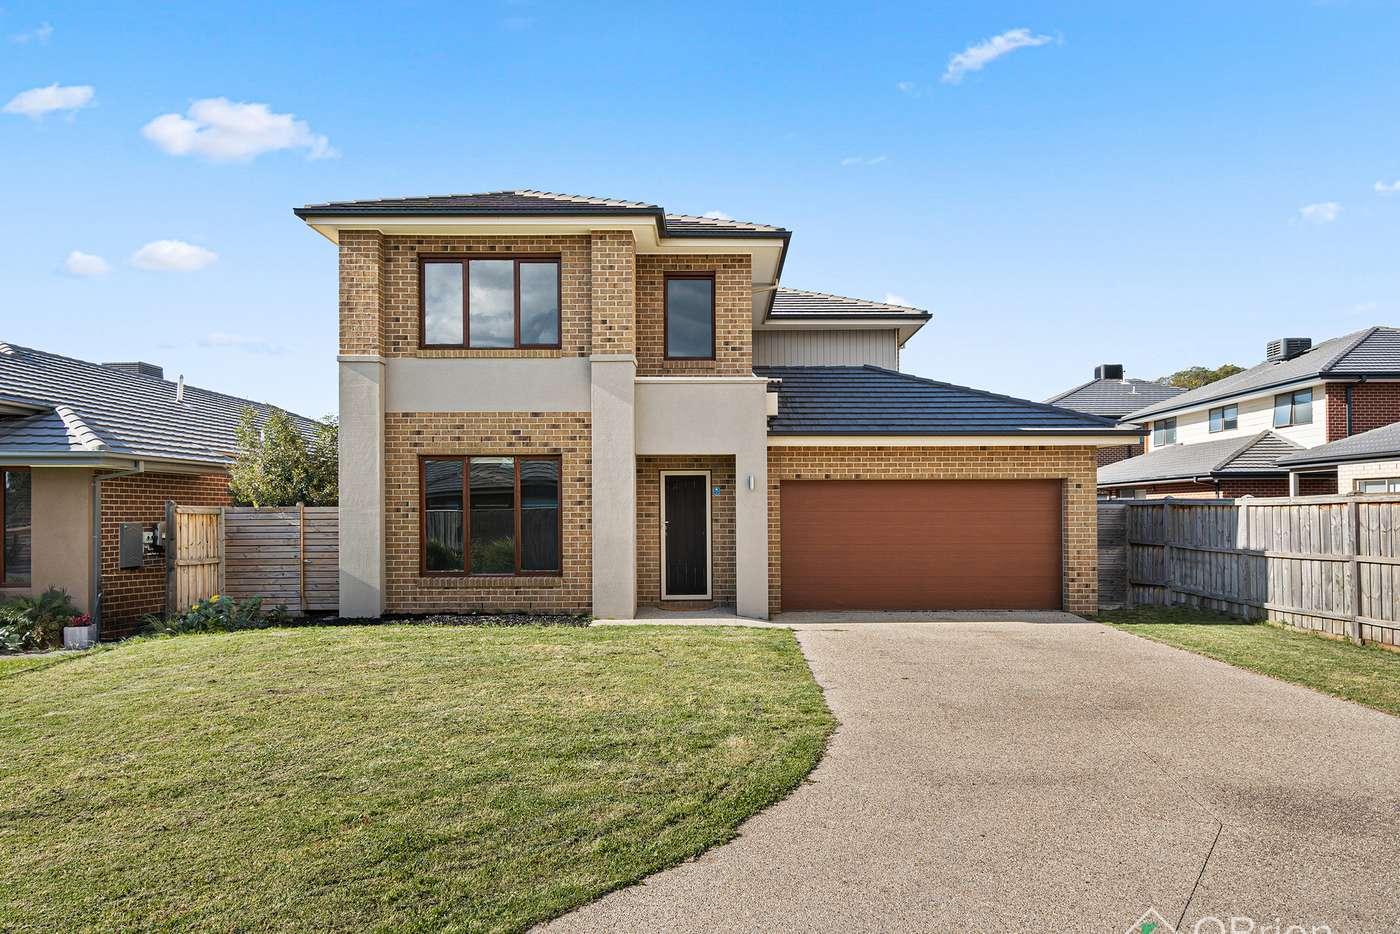 Main view of Homely house listing, 20 Glenfern Street, Keysborough VIC 3173